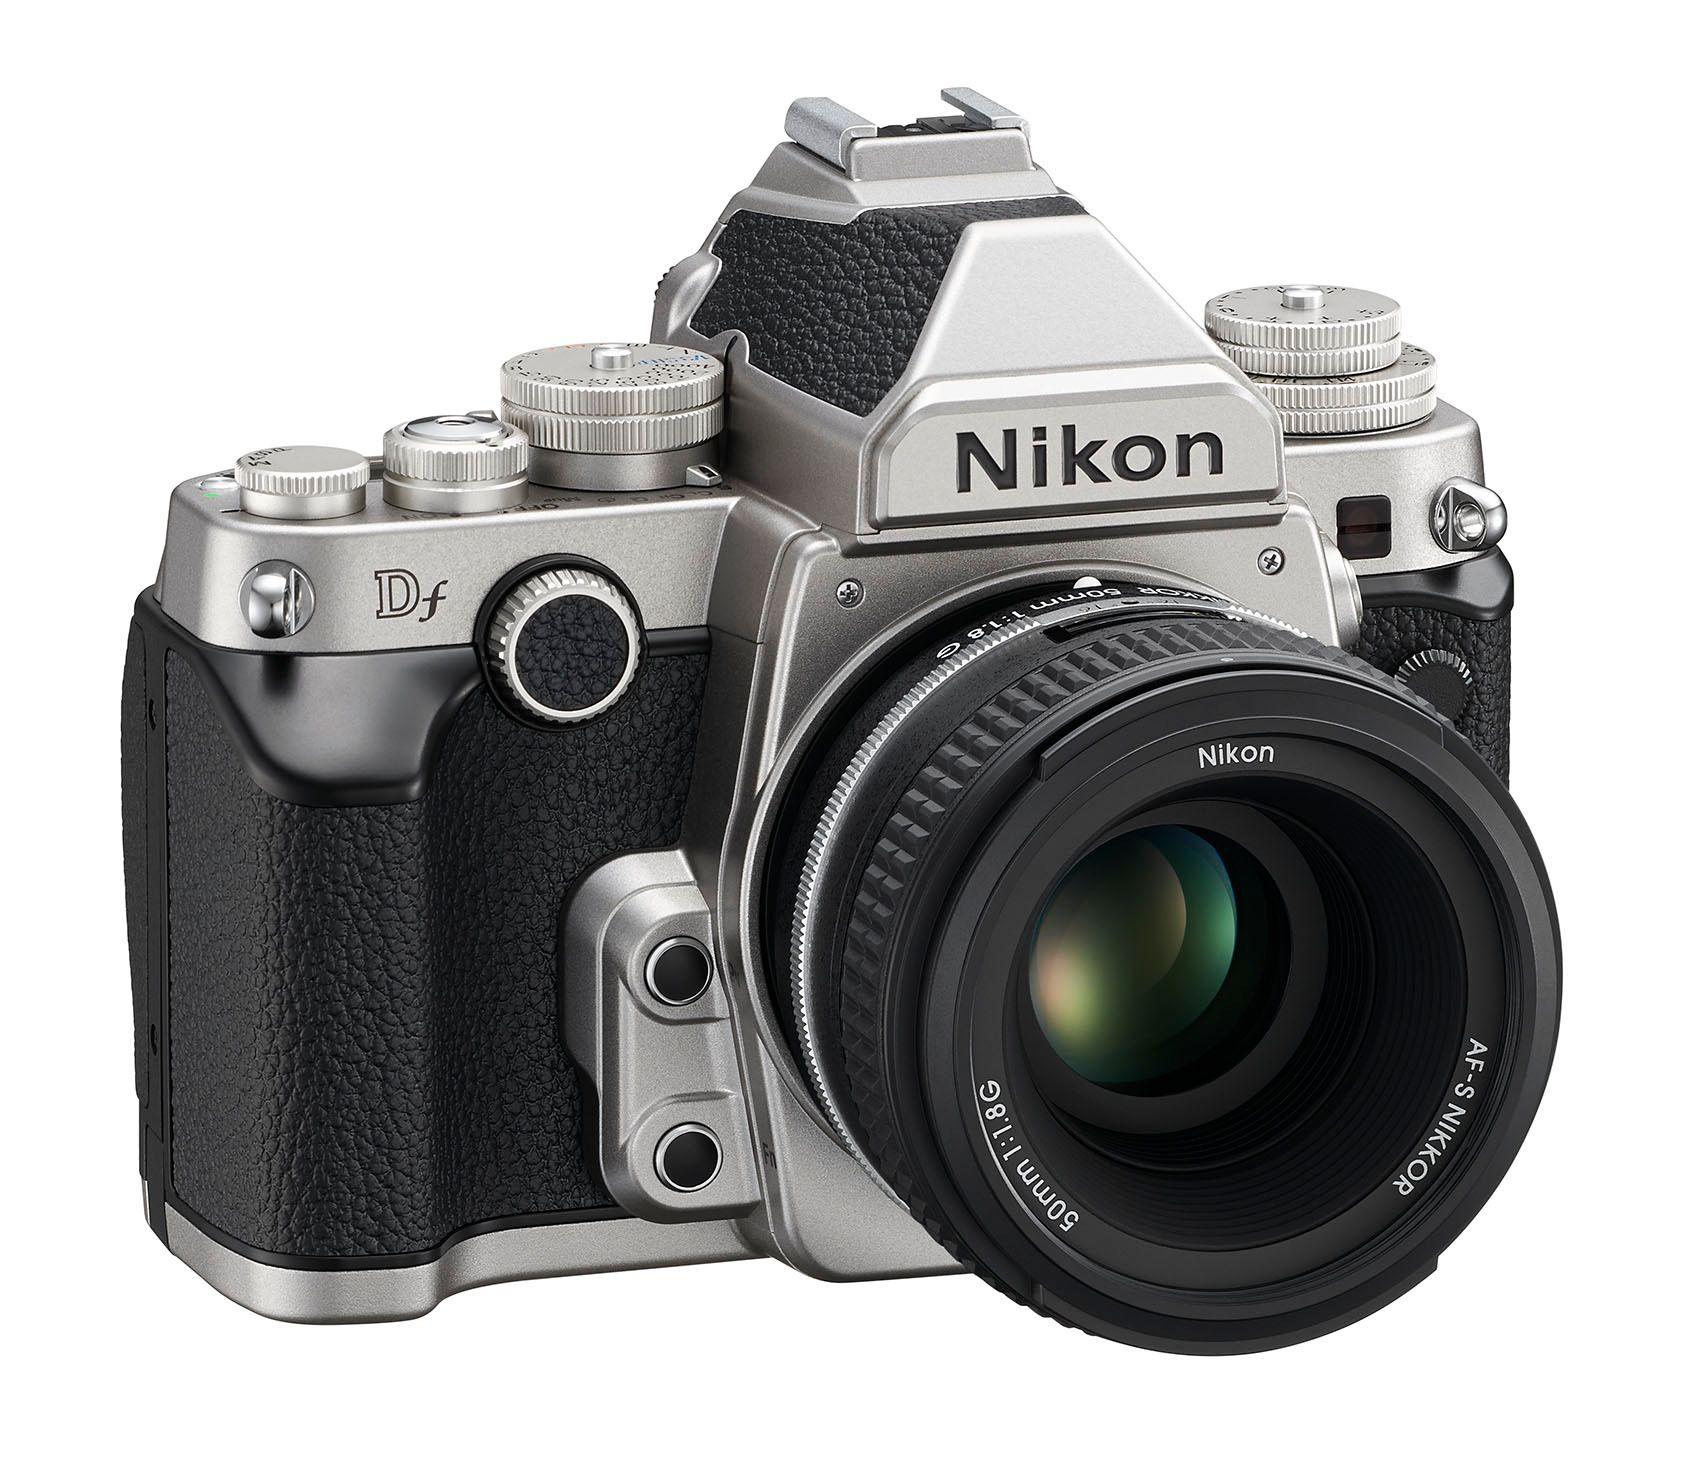 Nikon Df med 50mm f/1.8G.Foto: Nikon